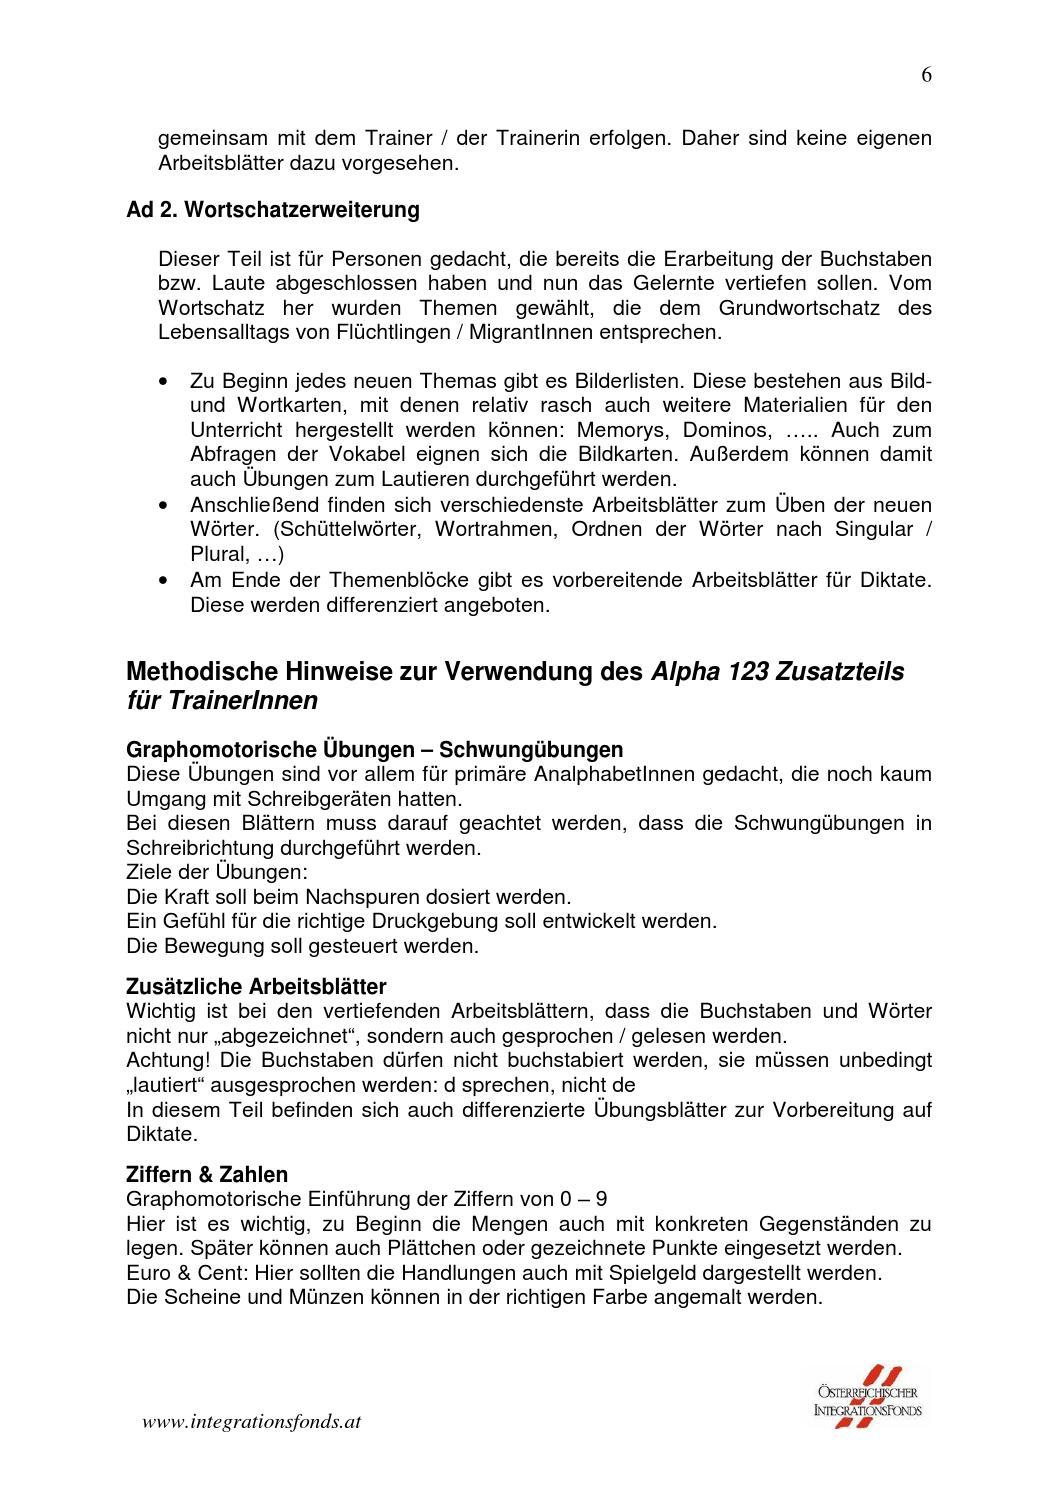 Beste Identifizieren Münzen Arbeitsblatt Galerie - Super Lehrer ...